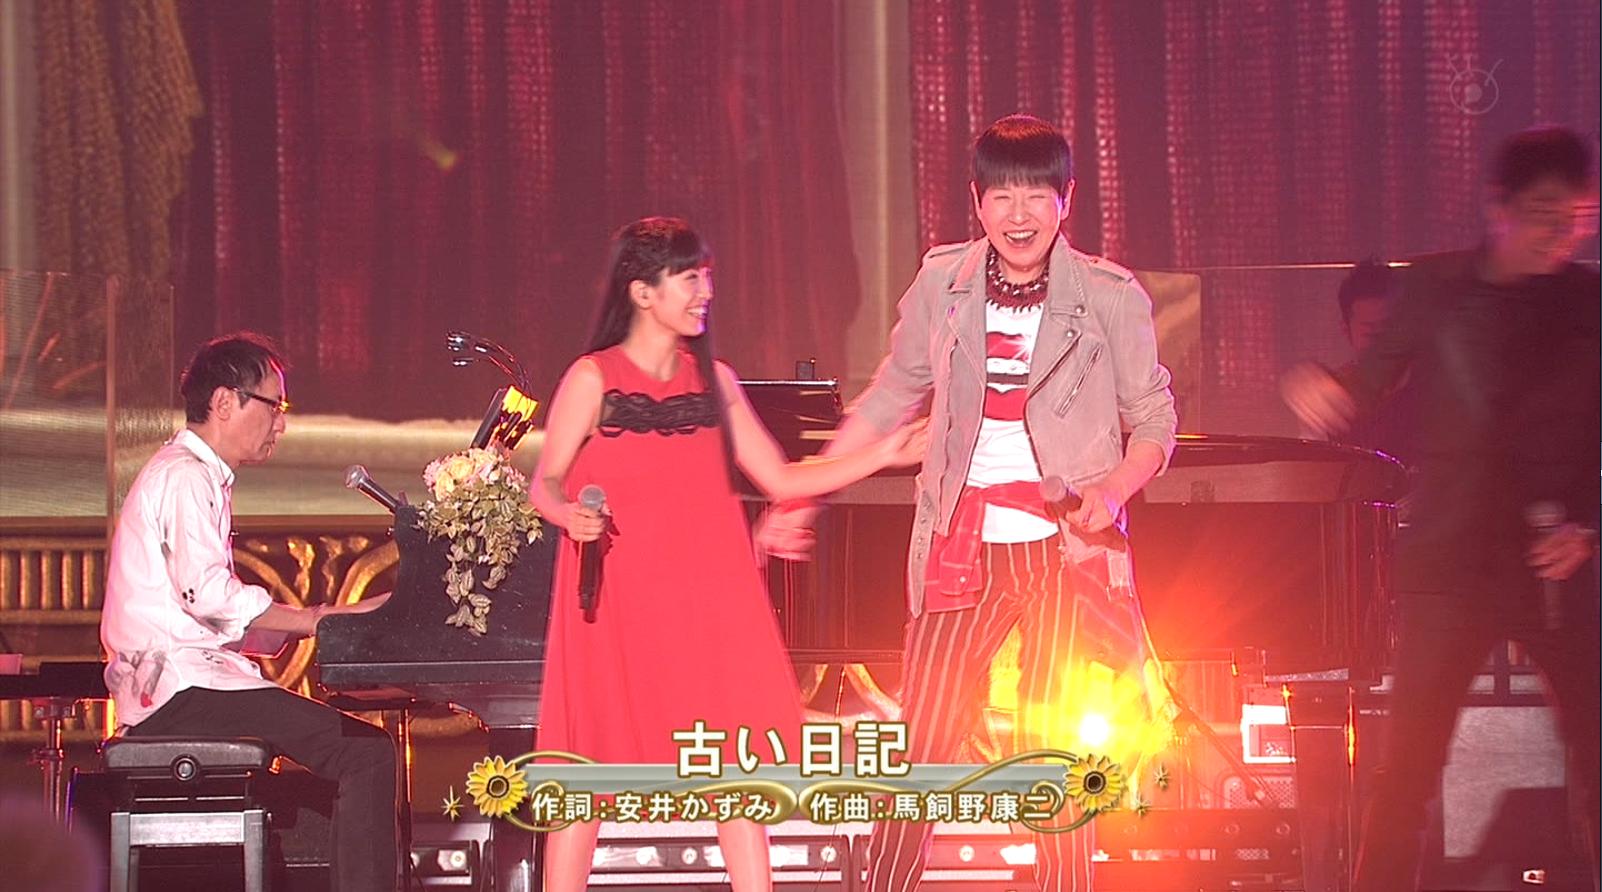 Wada-Akiko-Doshaburi-Furui-nikki -FNS-2014.8.13